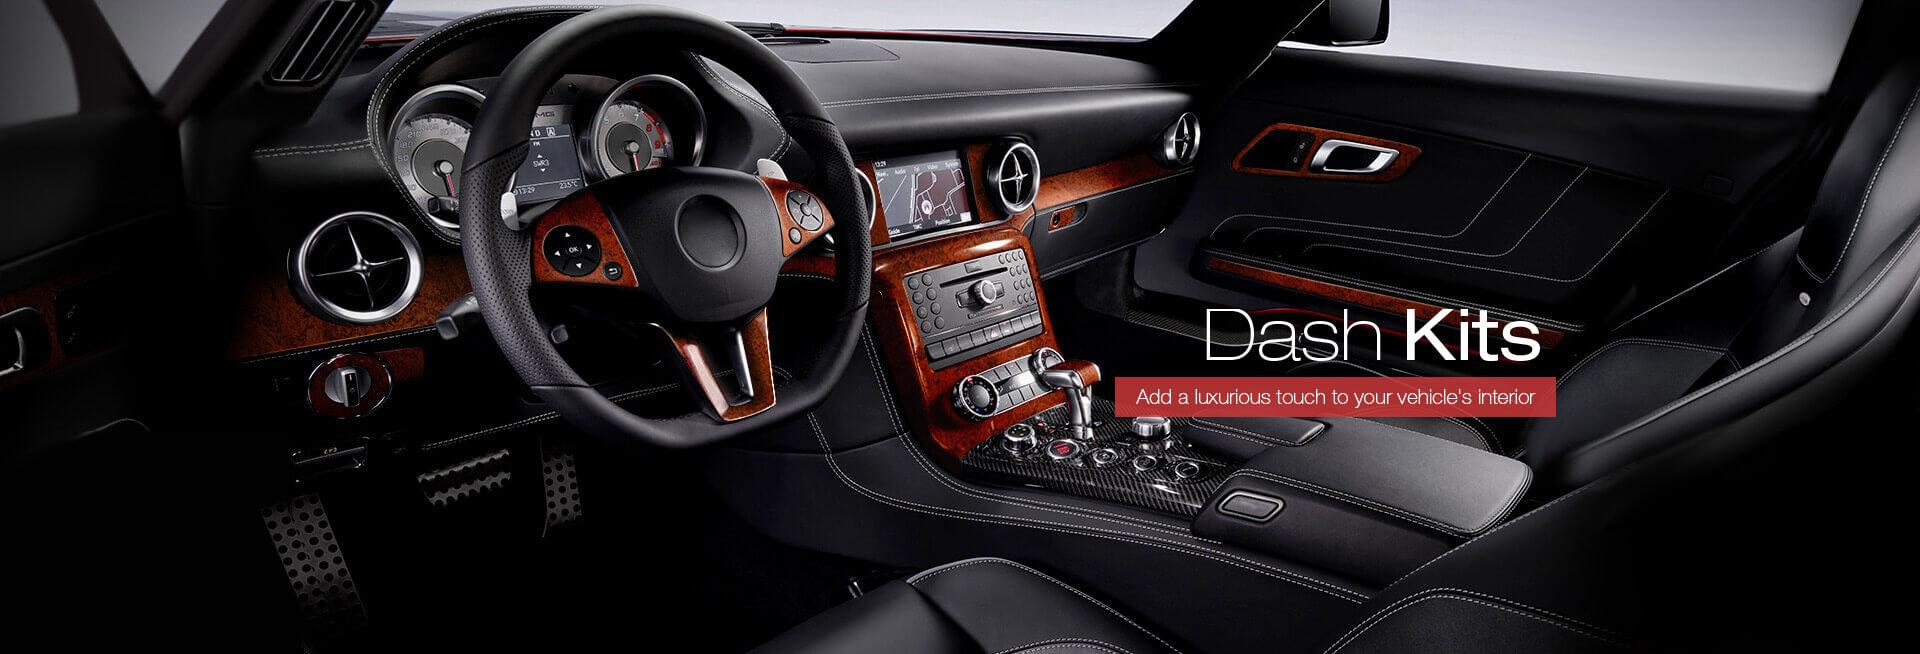 Nissan 350z wood grain dash kits daily delaware vanachro Image collections